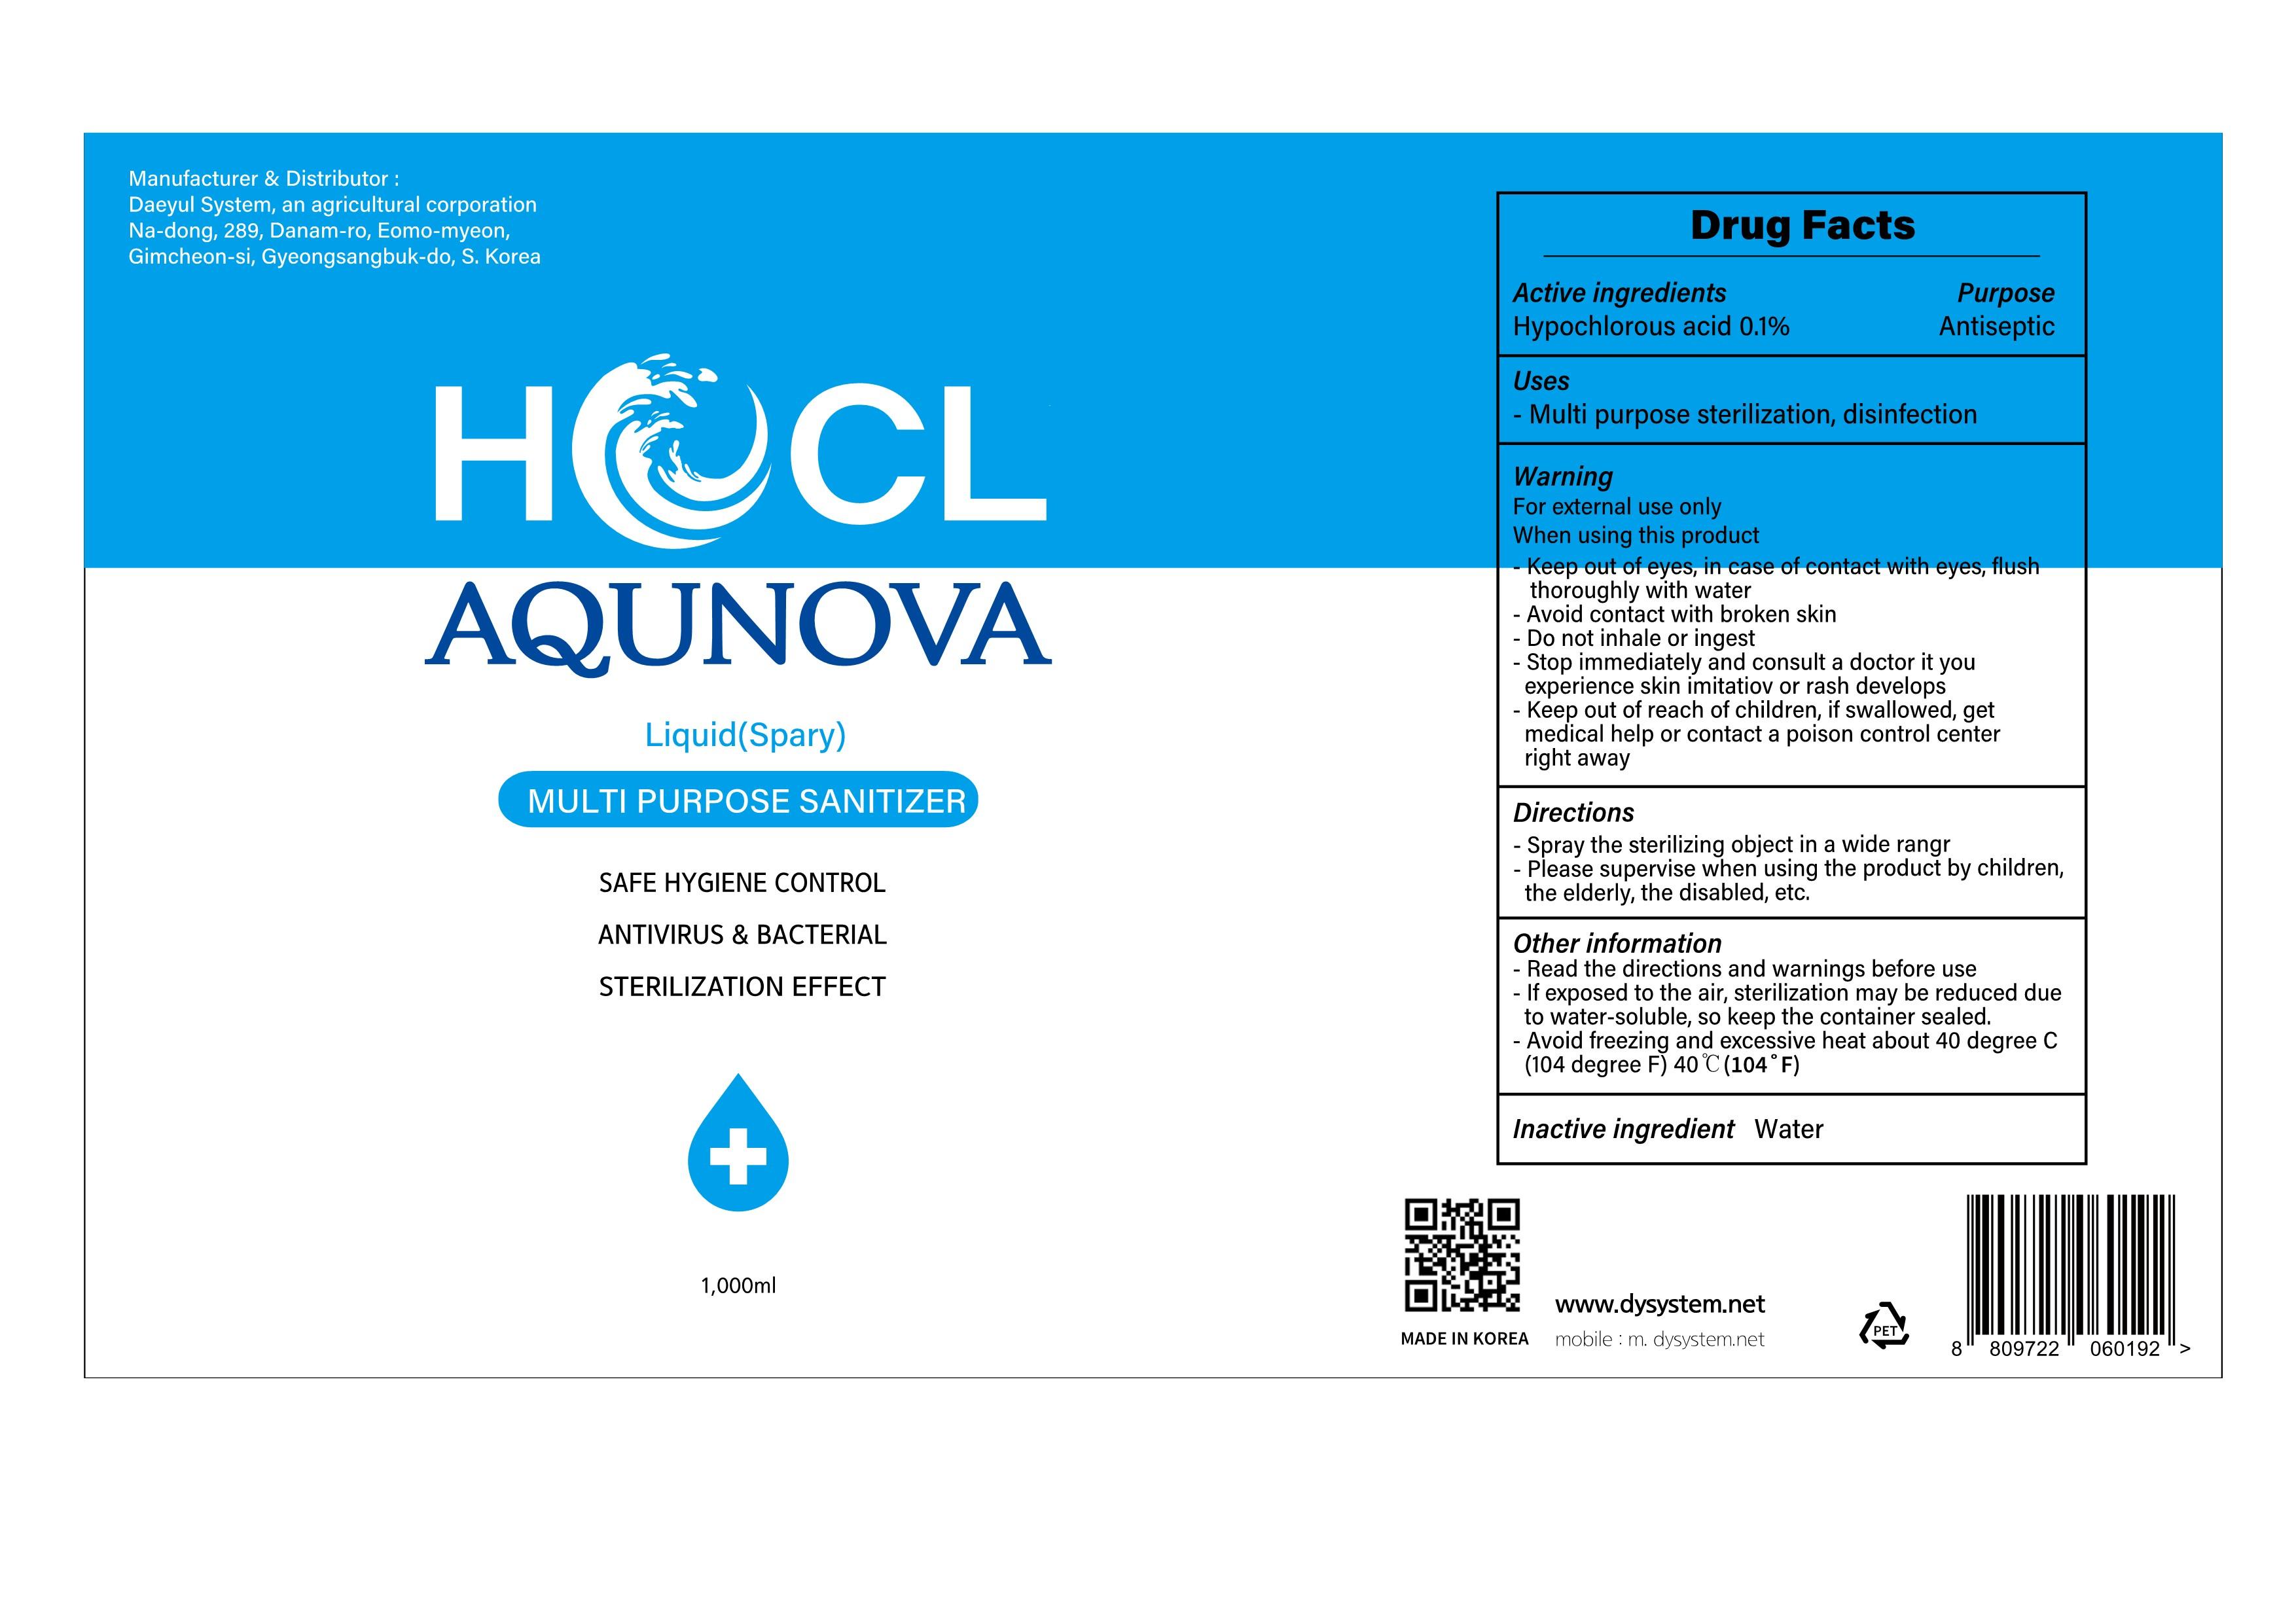 1000ml NDC: <a href=/NDC/80542-201-06>80542-201-06</a> Label